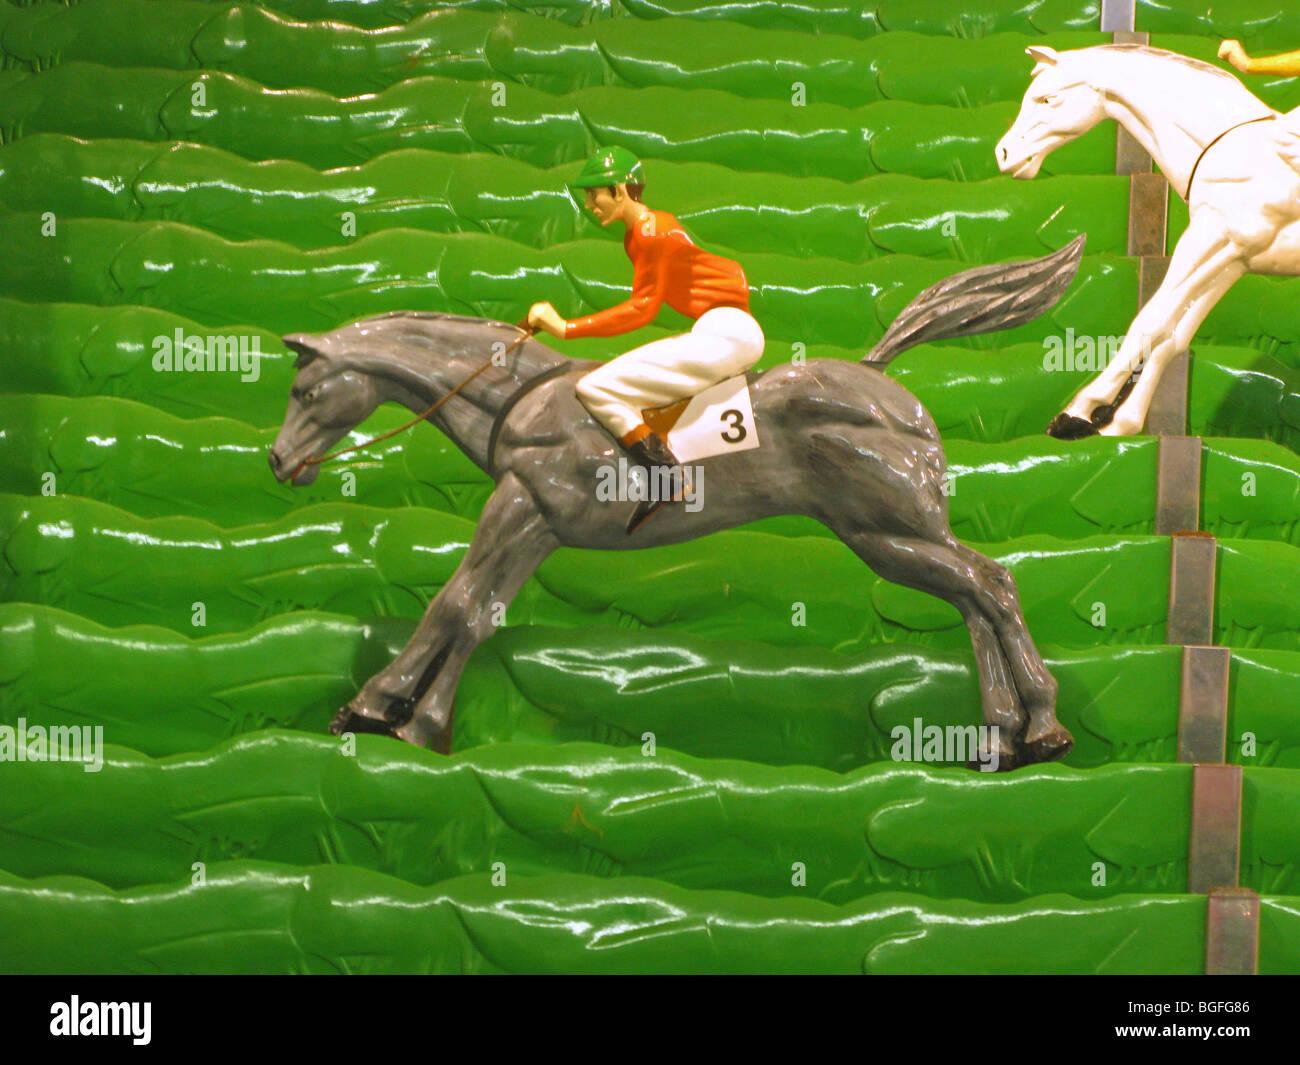 Juego de diversiones juguetes - Horse Racing Imagen De Stock